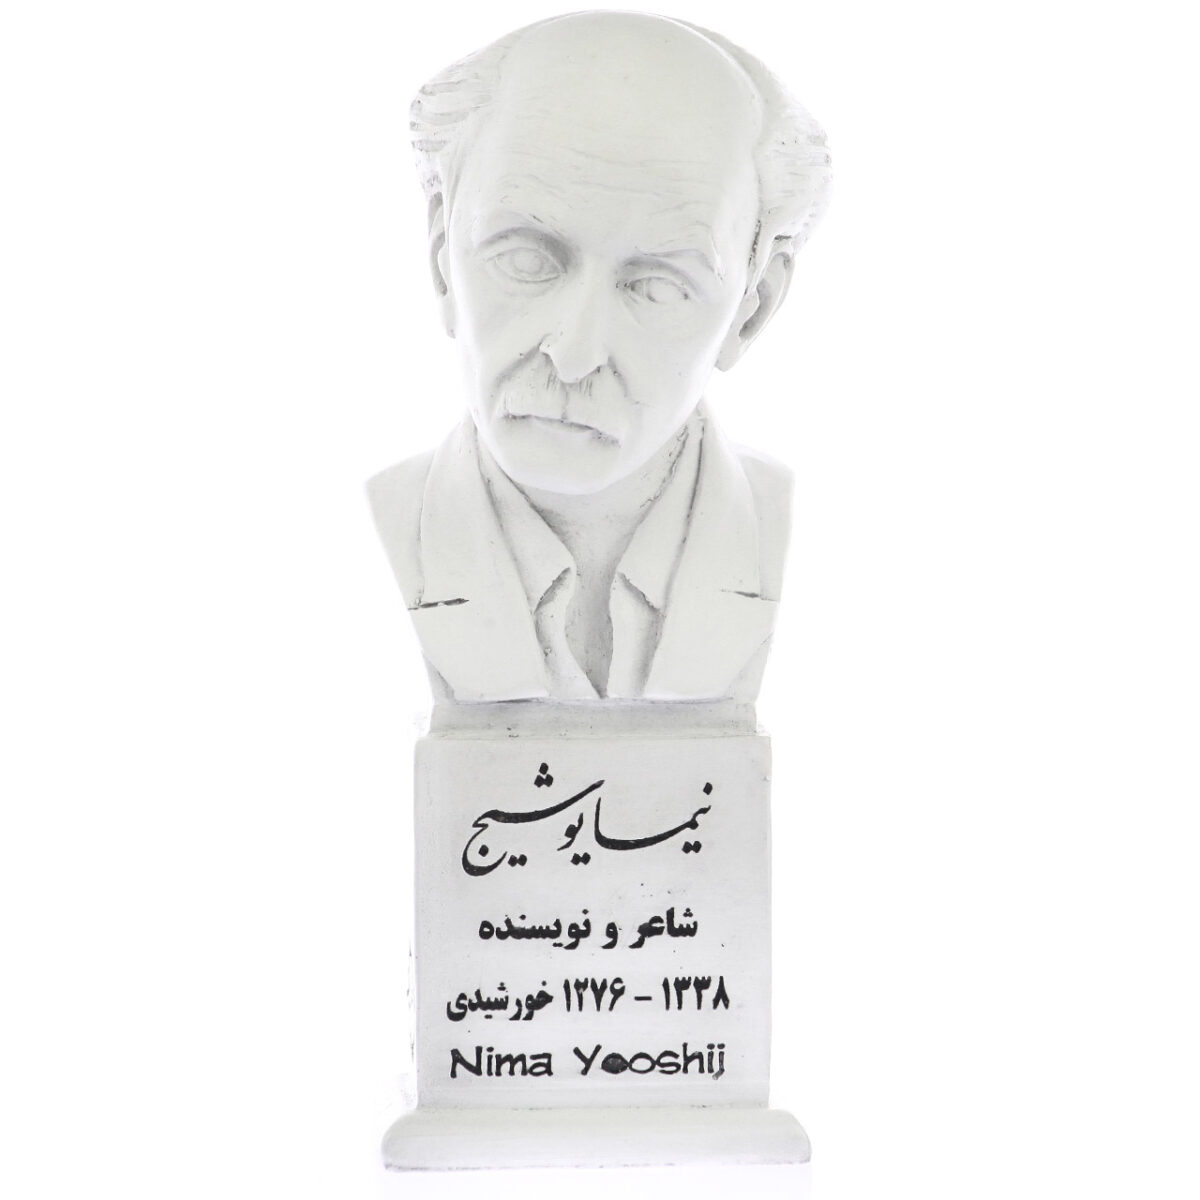 nima youshij s 1200x1200 - سردیس نیما یوشیج